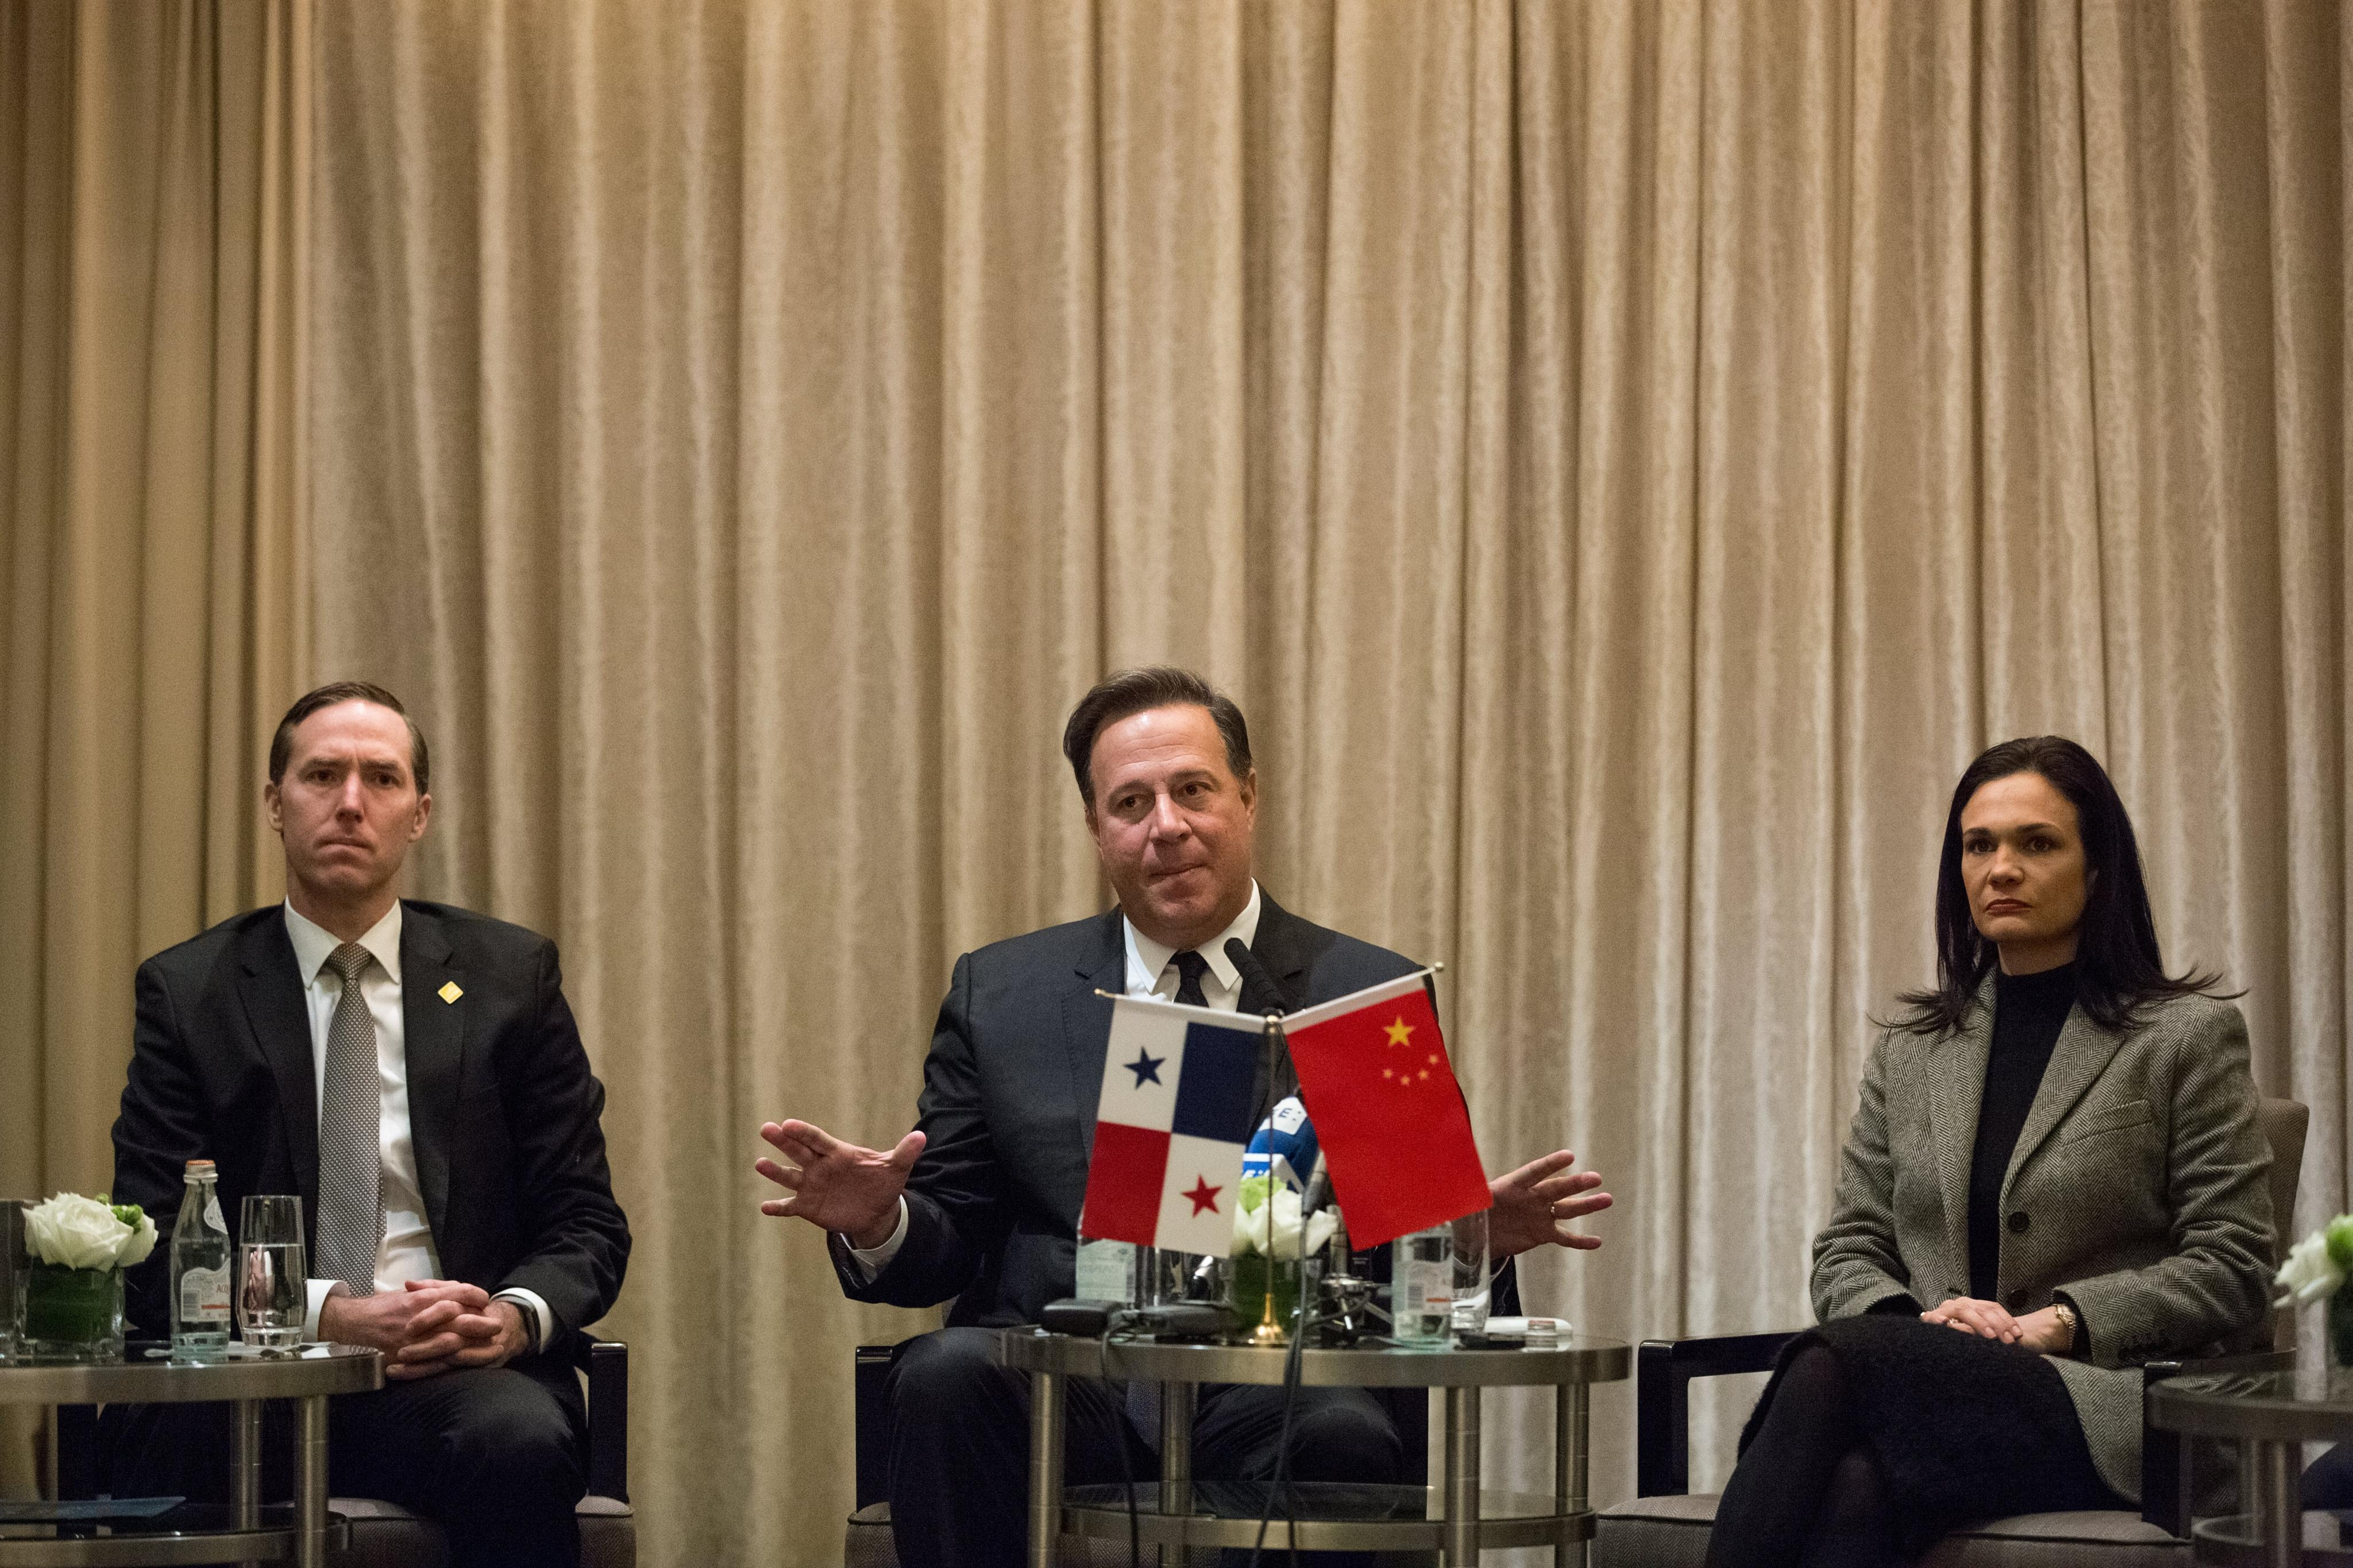 Anuncian vuelos directos de China a Panamá desde marzo de 2018